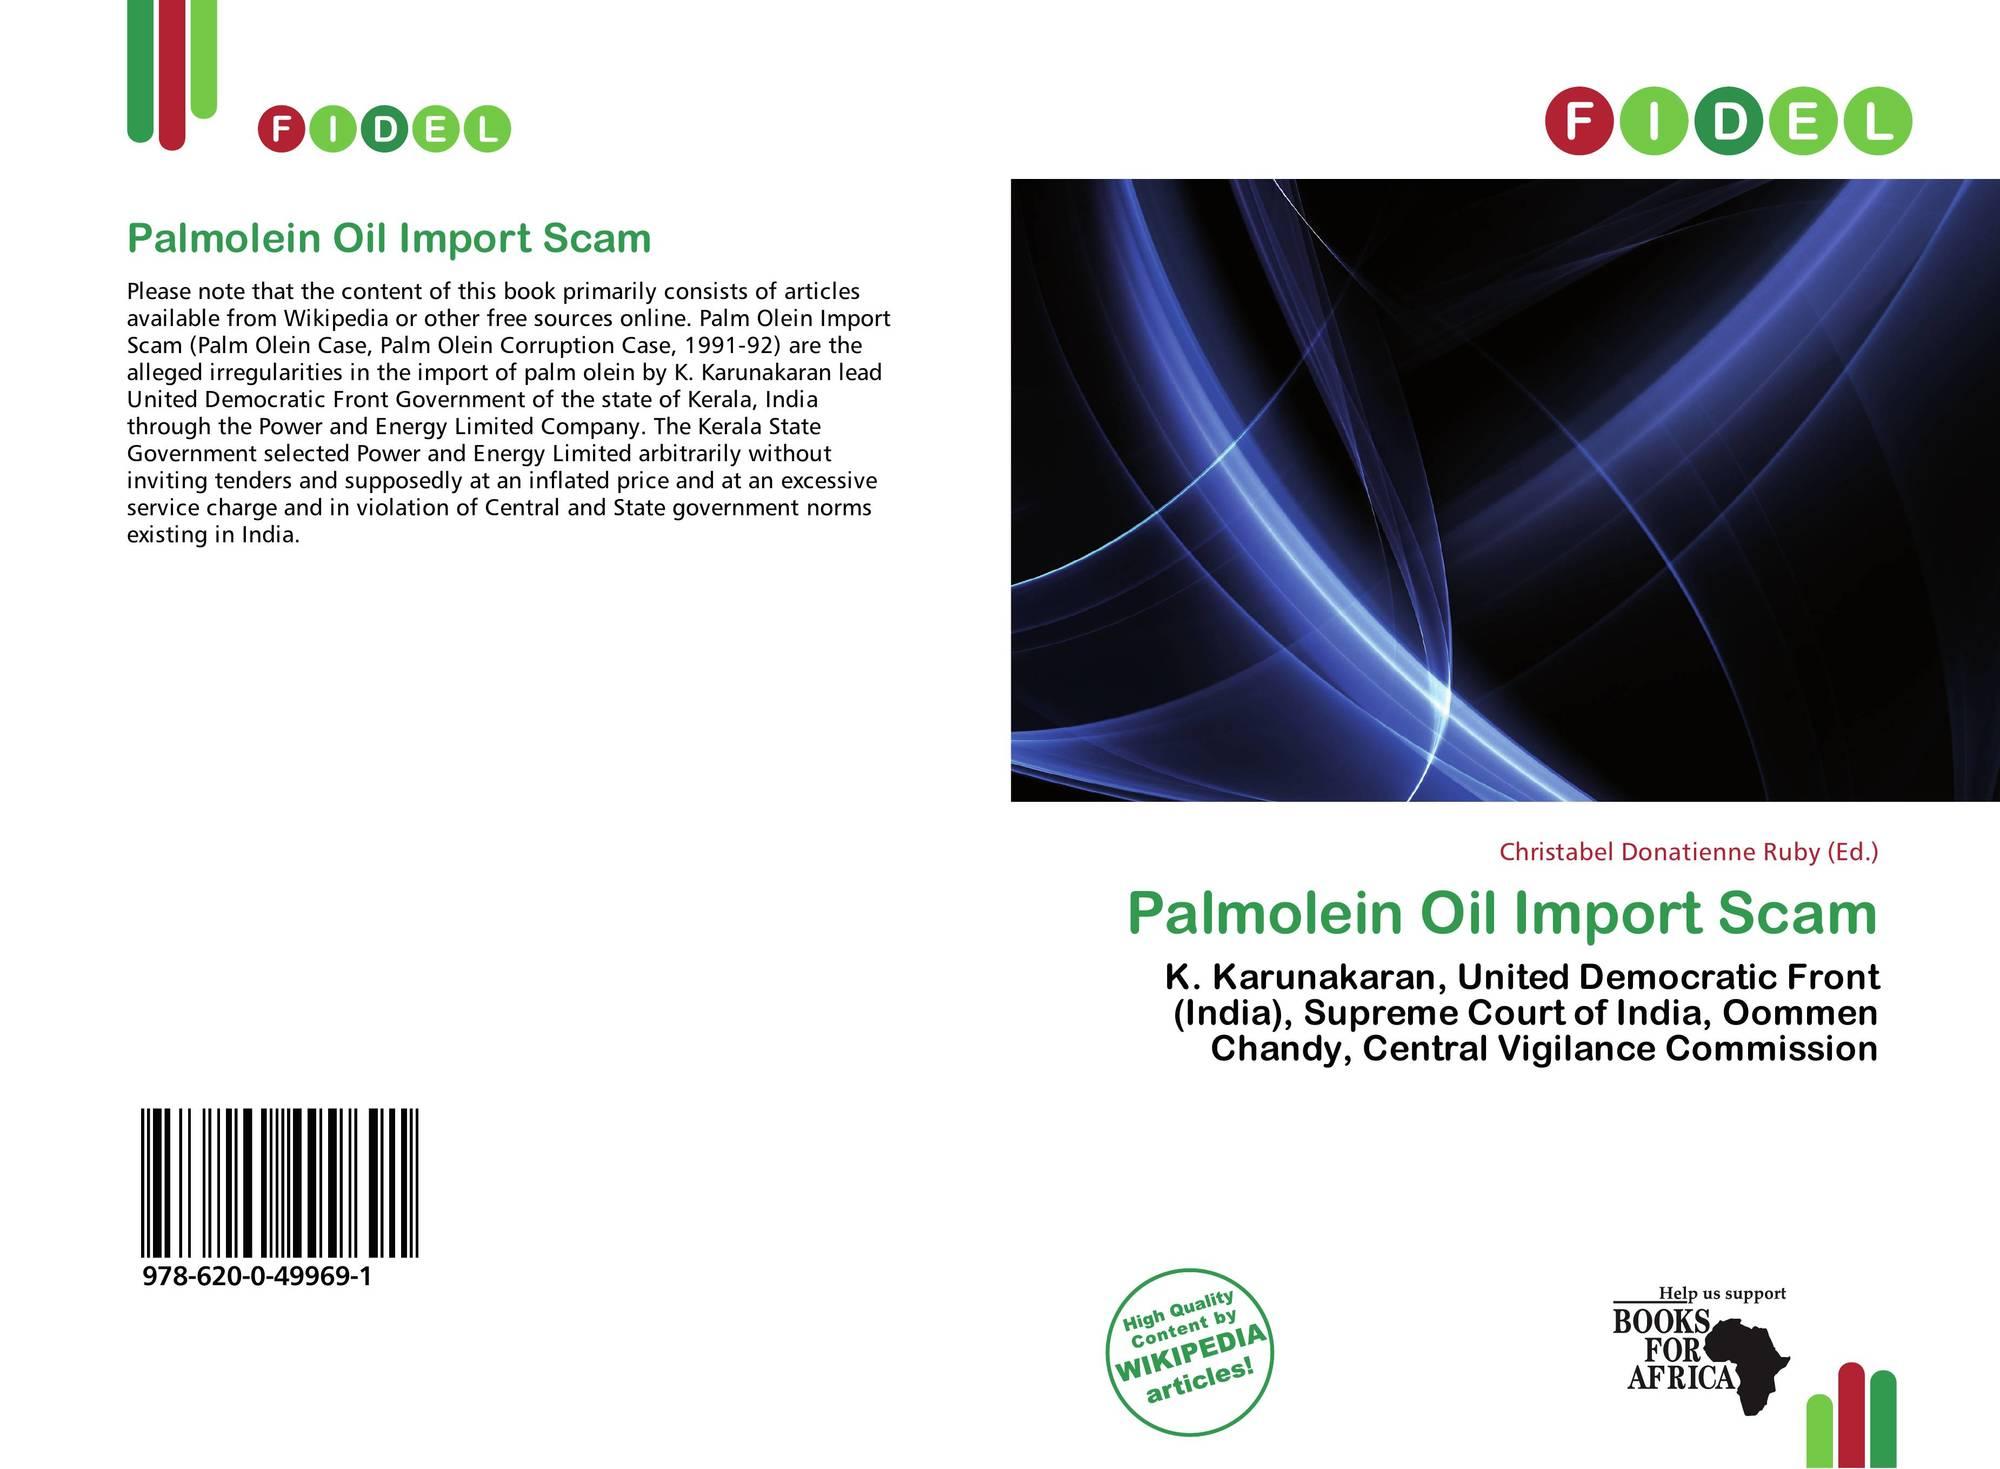 Palmolein Oil Import Scam, 978-620-0-49969-1, 6200499691